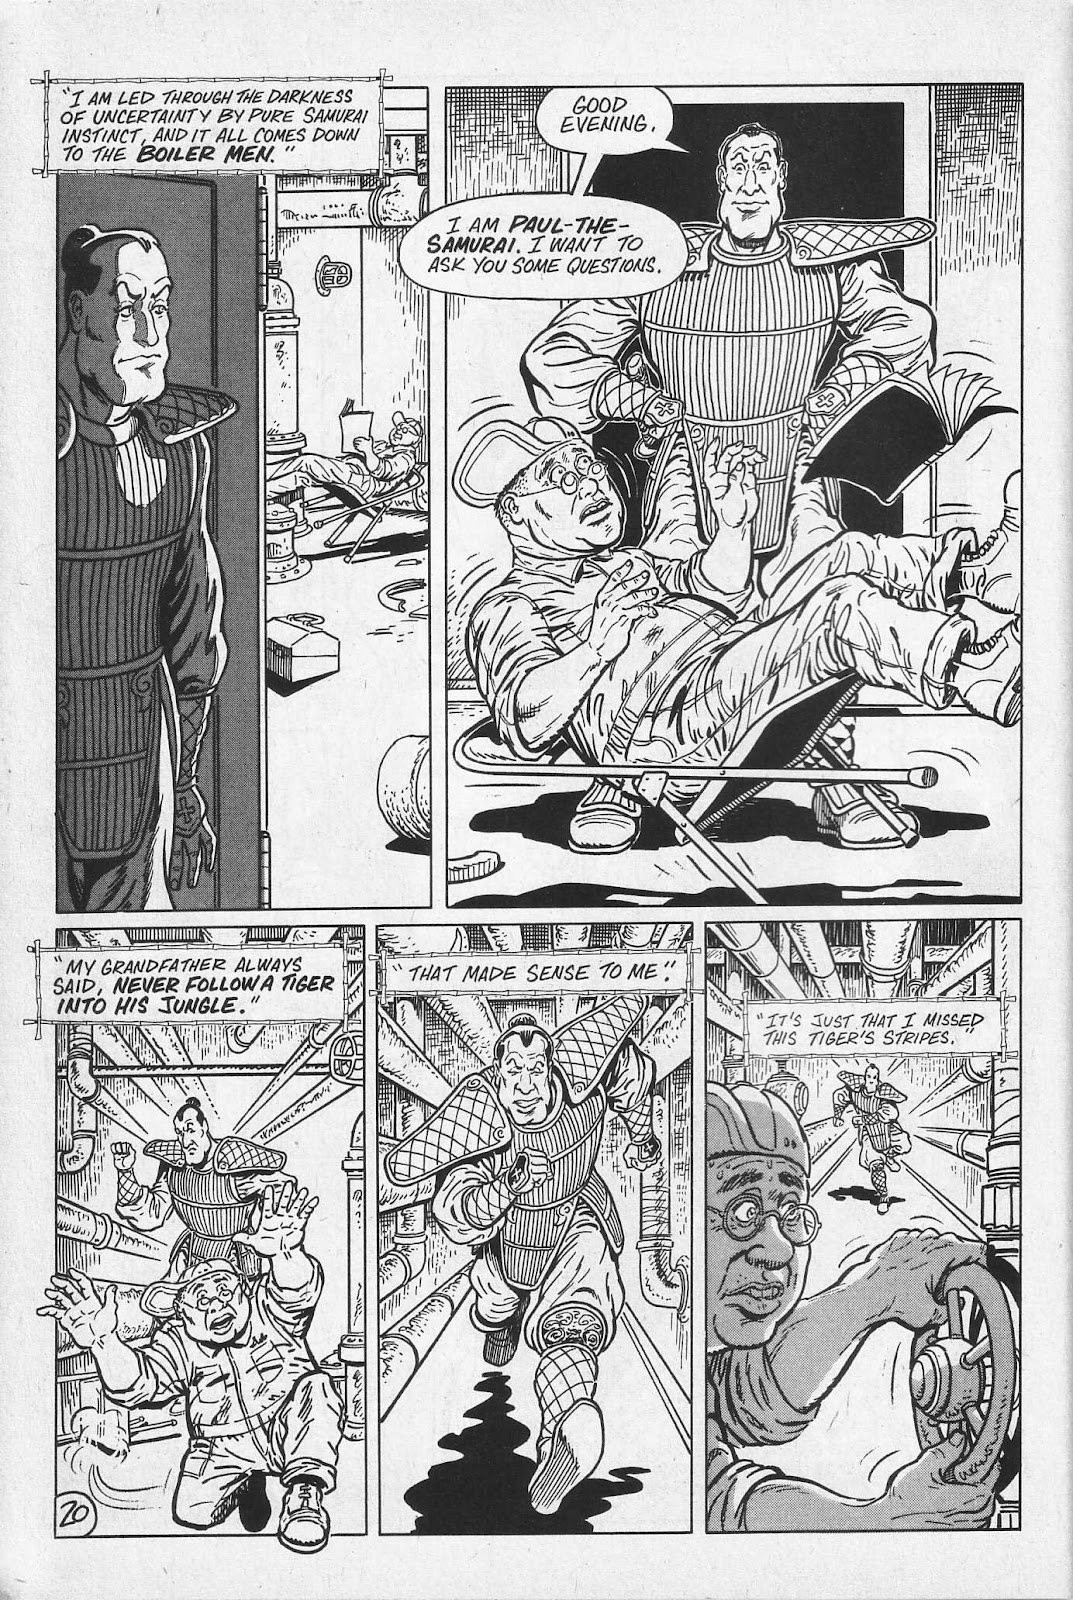 Read online Paul the Samurai (1991) comic -  Issue # TPB - 26